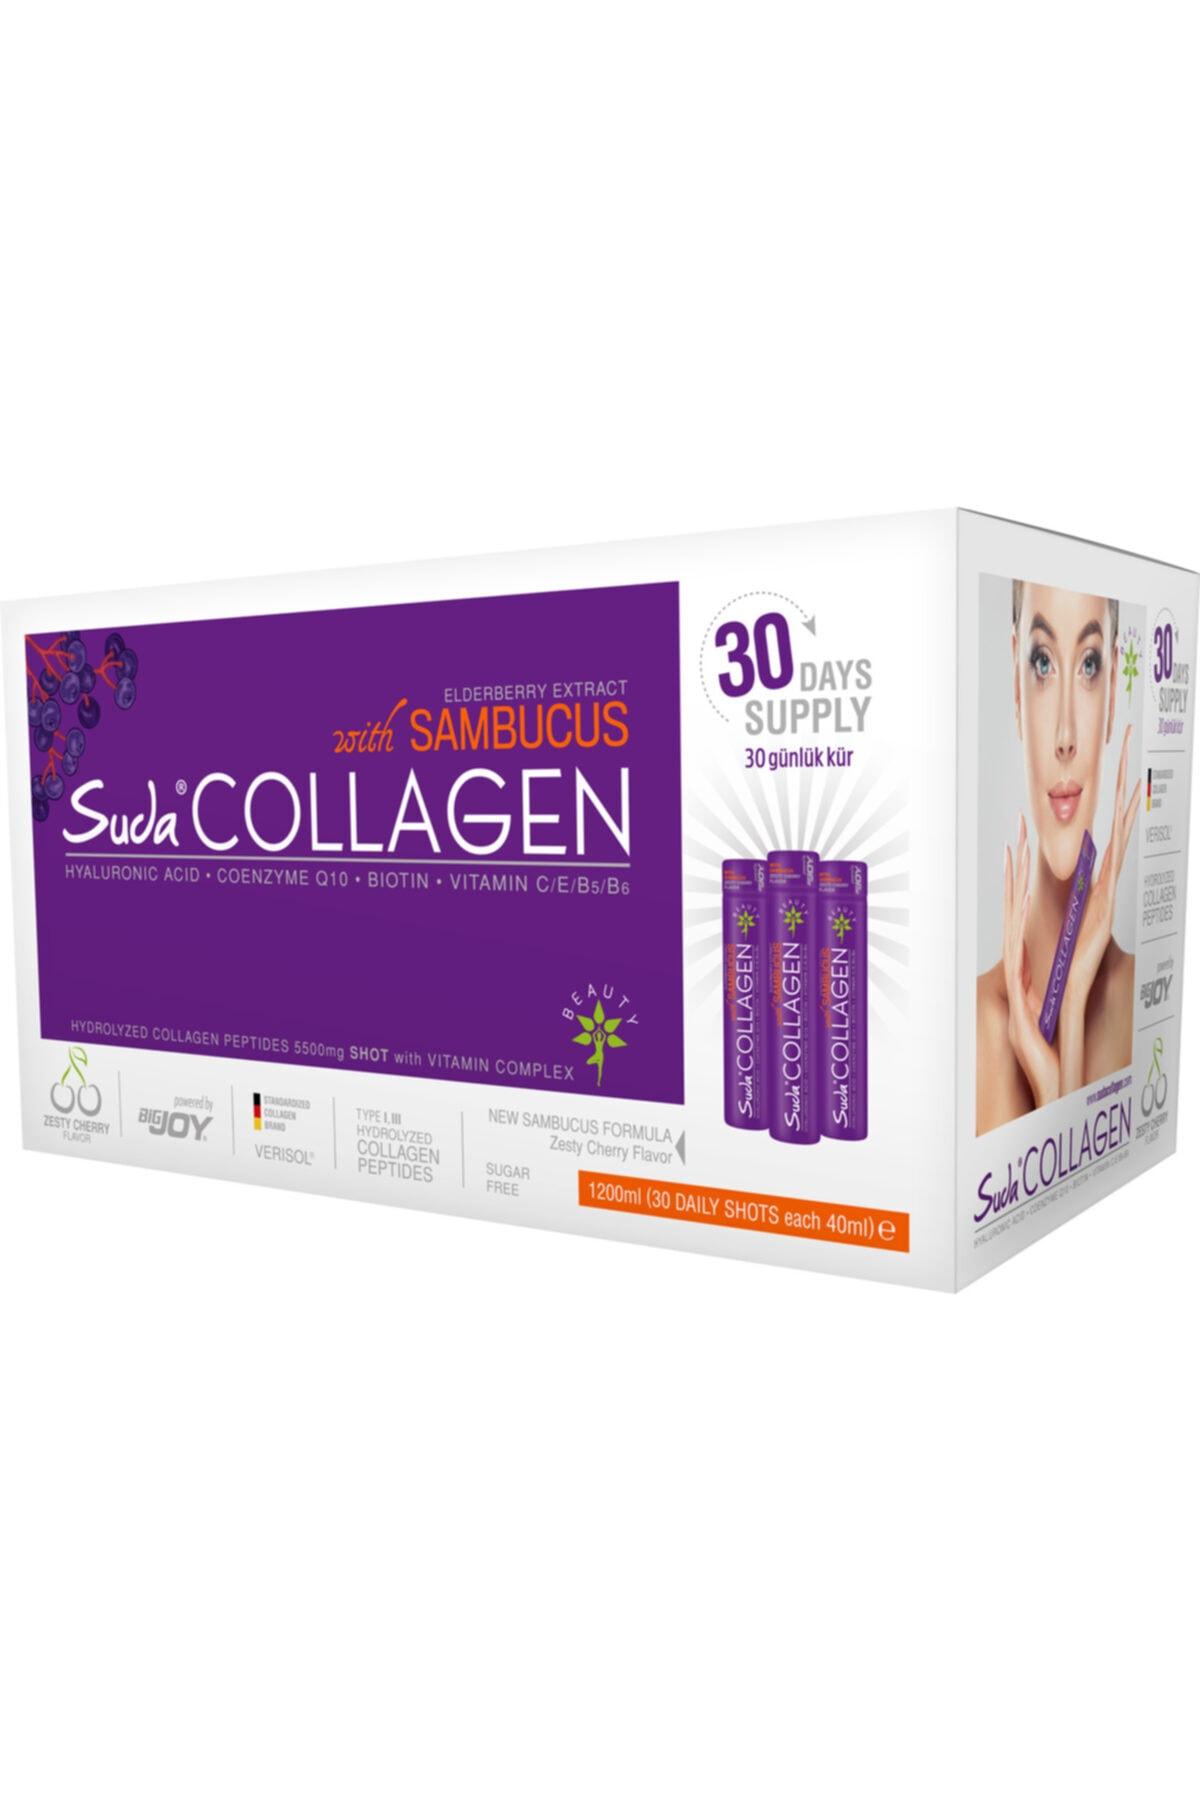 Suda Collagen Sambucus Vişne Aromalı 40 ml x 30 Shot 1